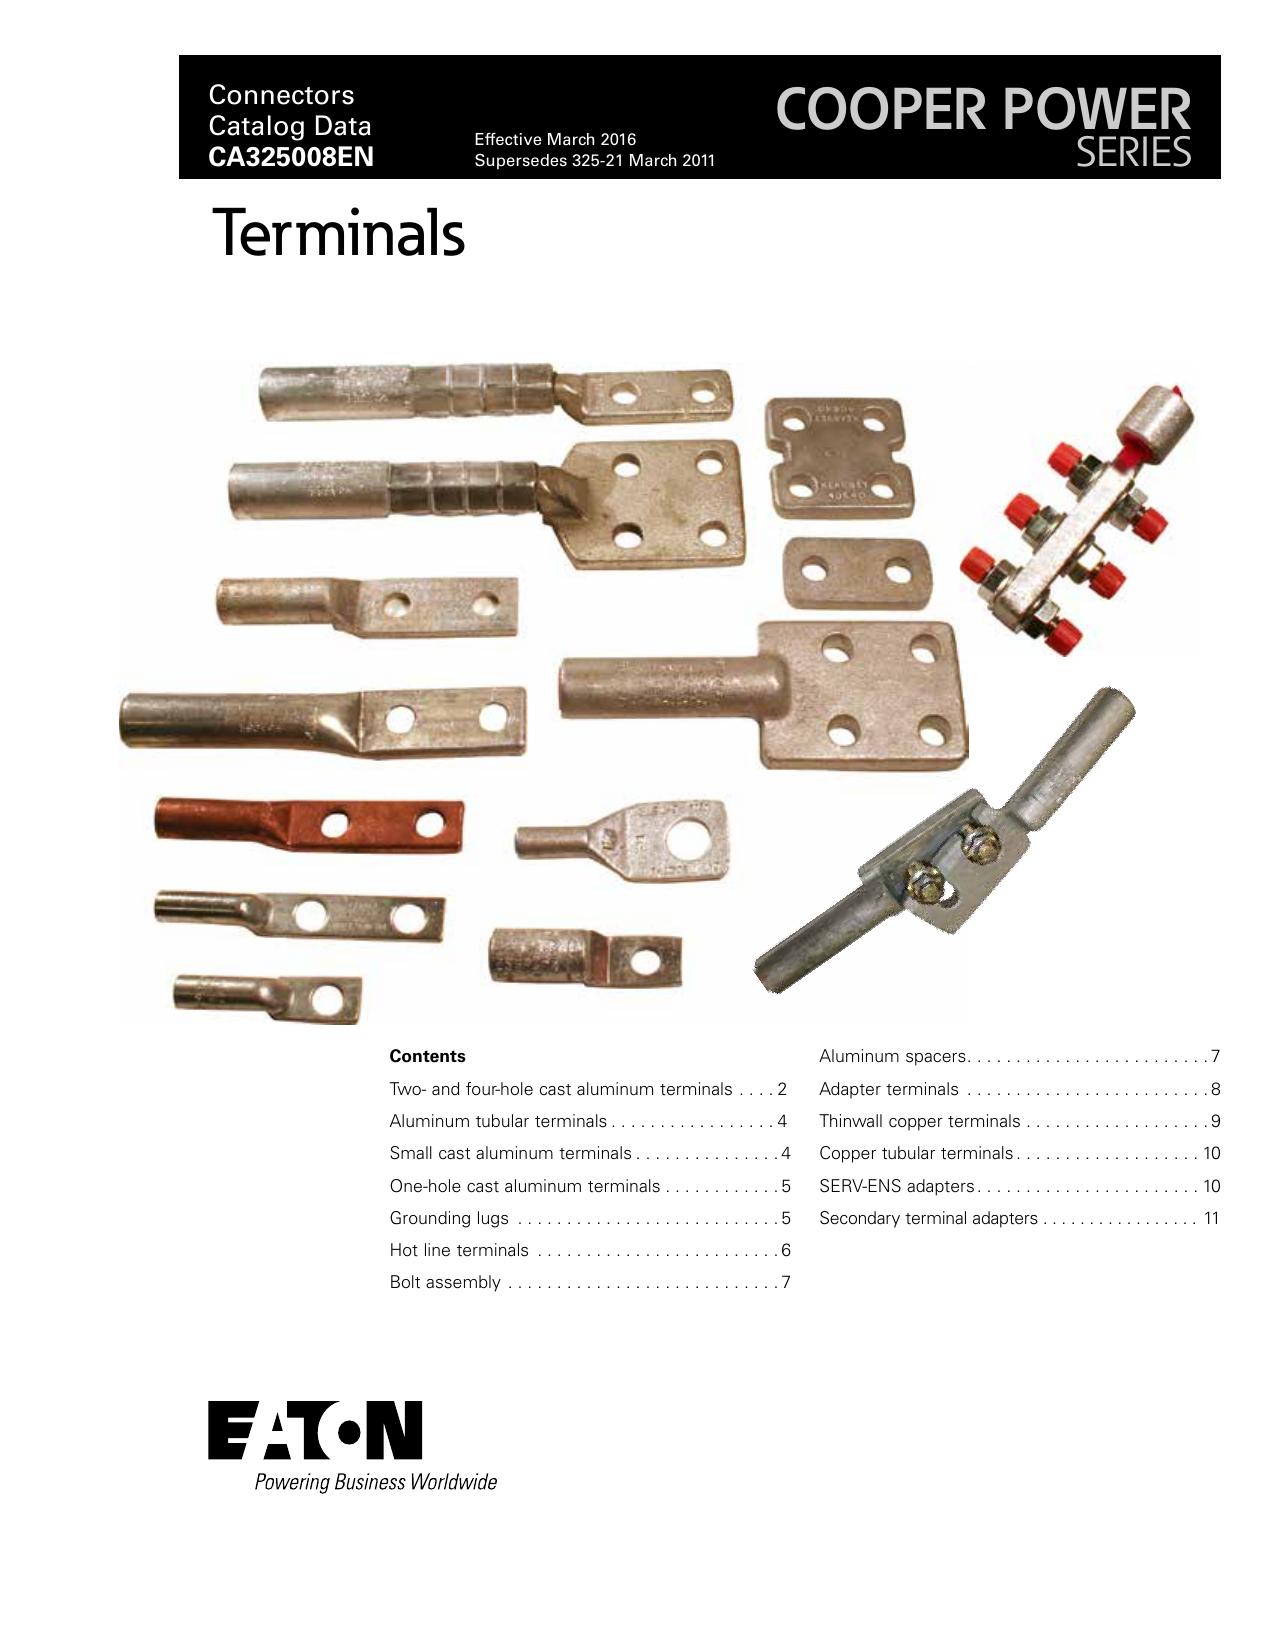 Terminals Cooper Power Series Connectors Aluminum Wiring